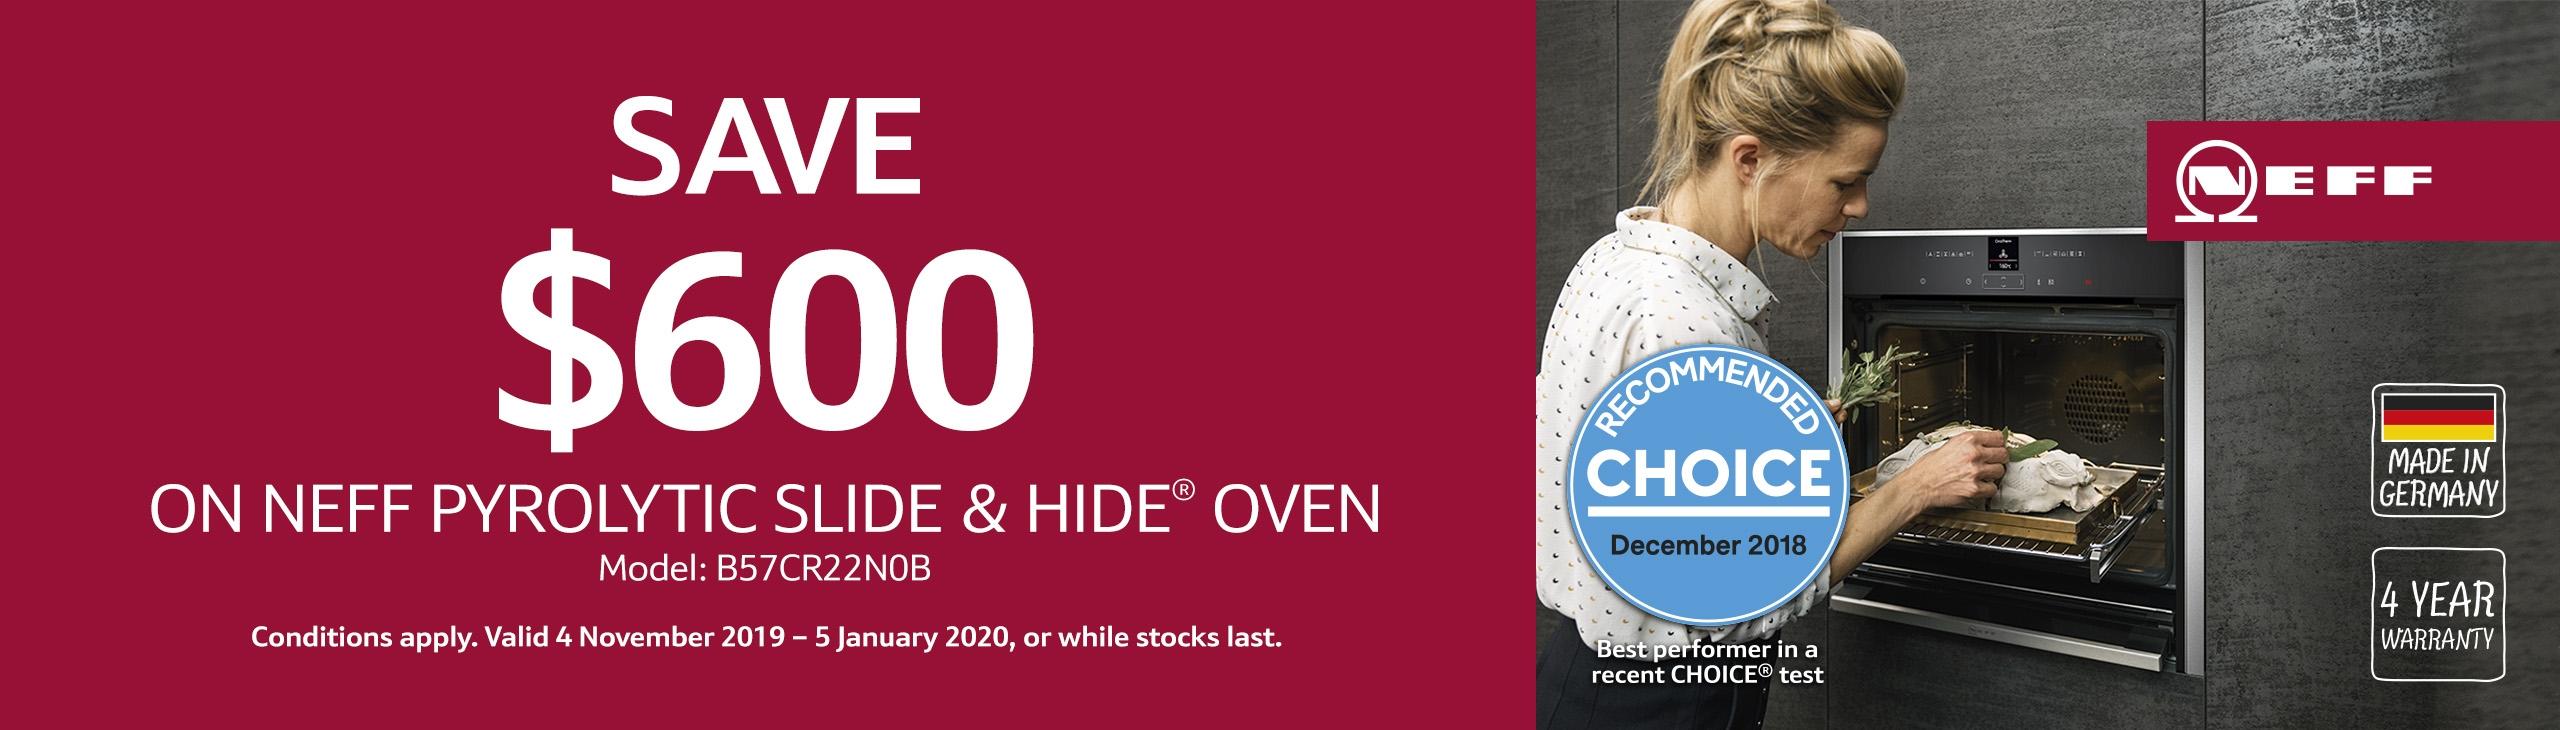 NEFF Pyrolytic Slide & Hide Oven B57CR22N0B Save $600